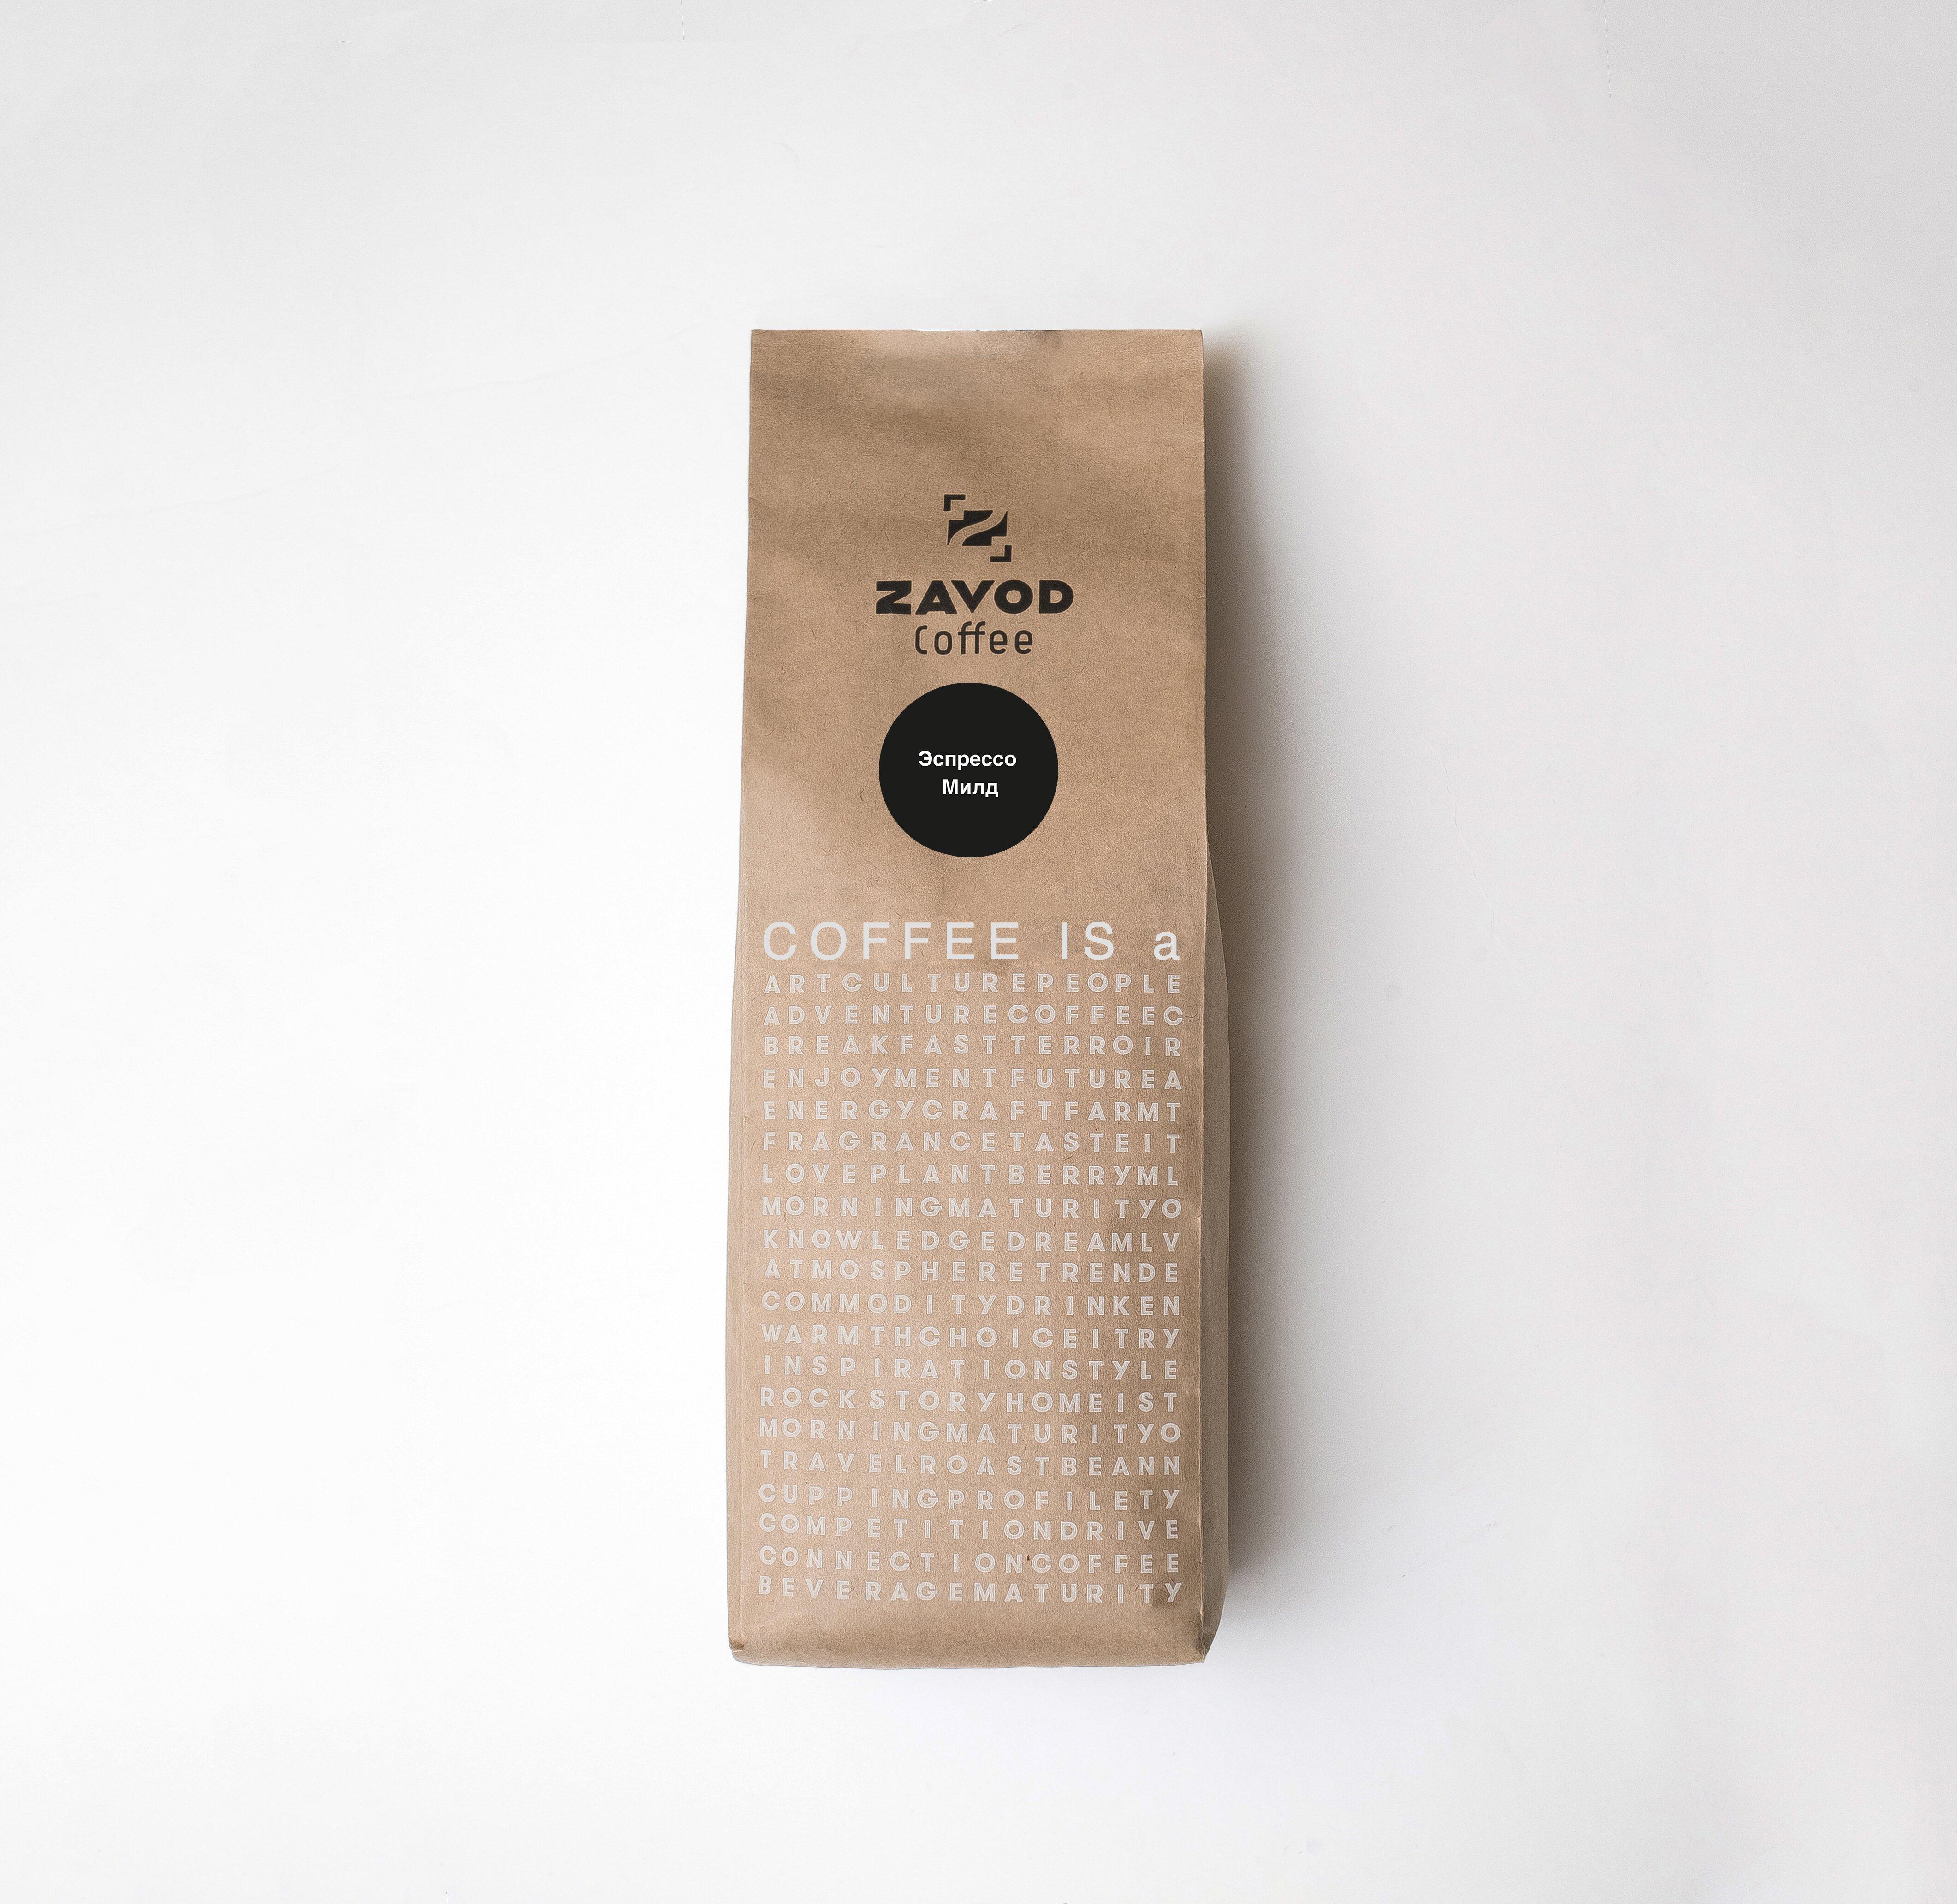 Кофе зерновой ZAVOD COFFEE  Эспрессо Милд (20% робуста)